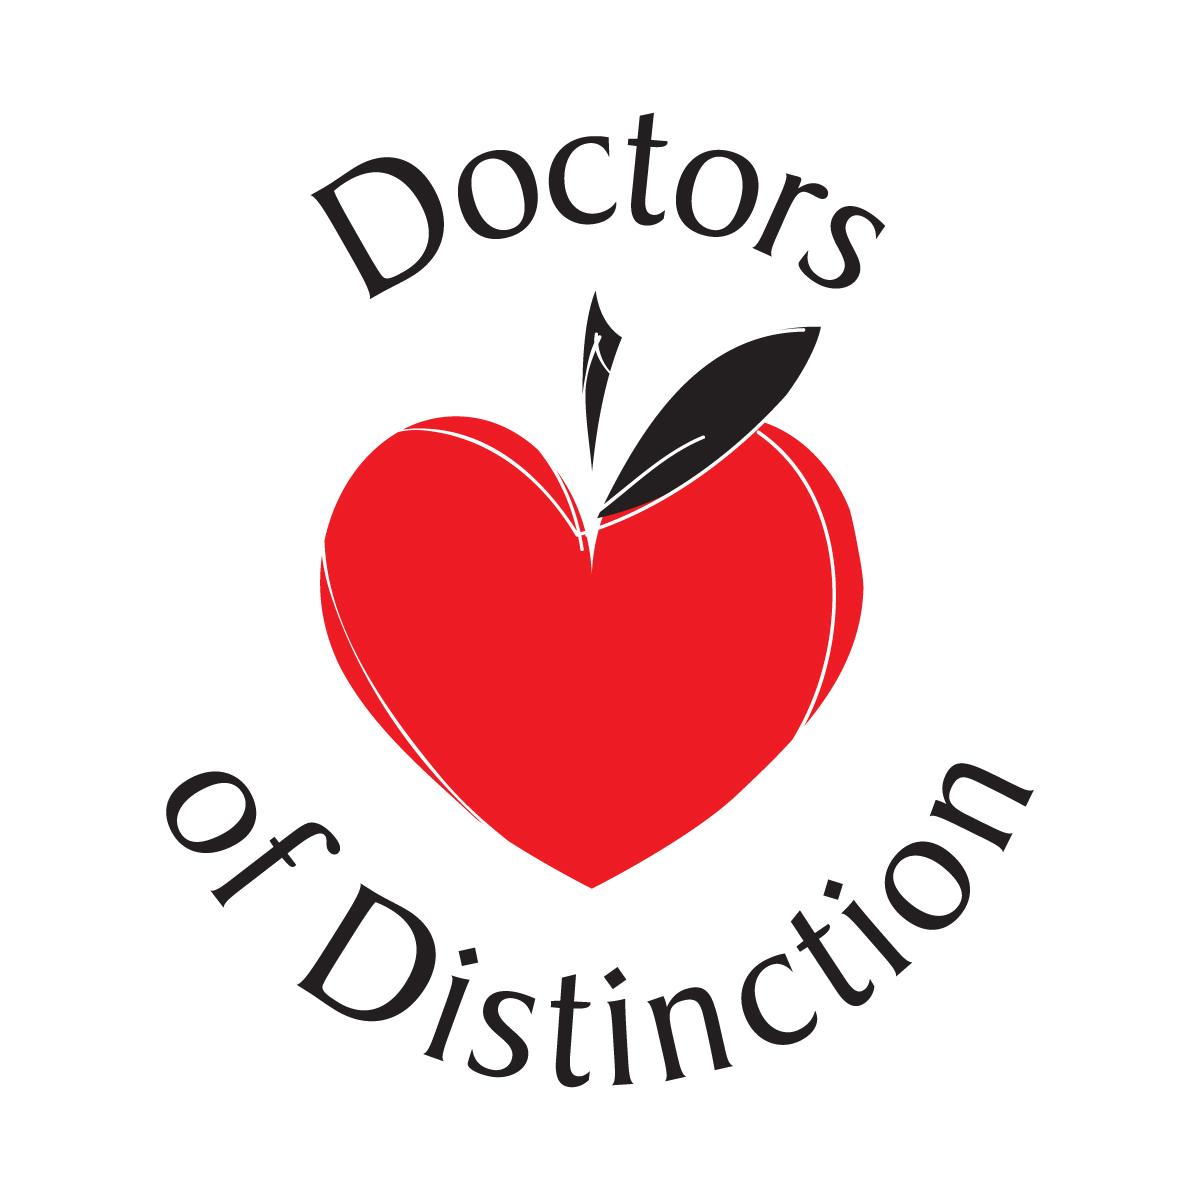 Doctors_logo_01.jpg